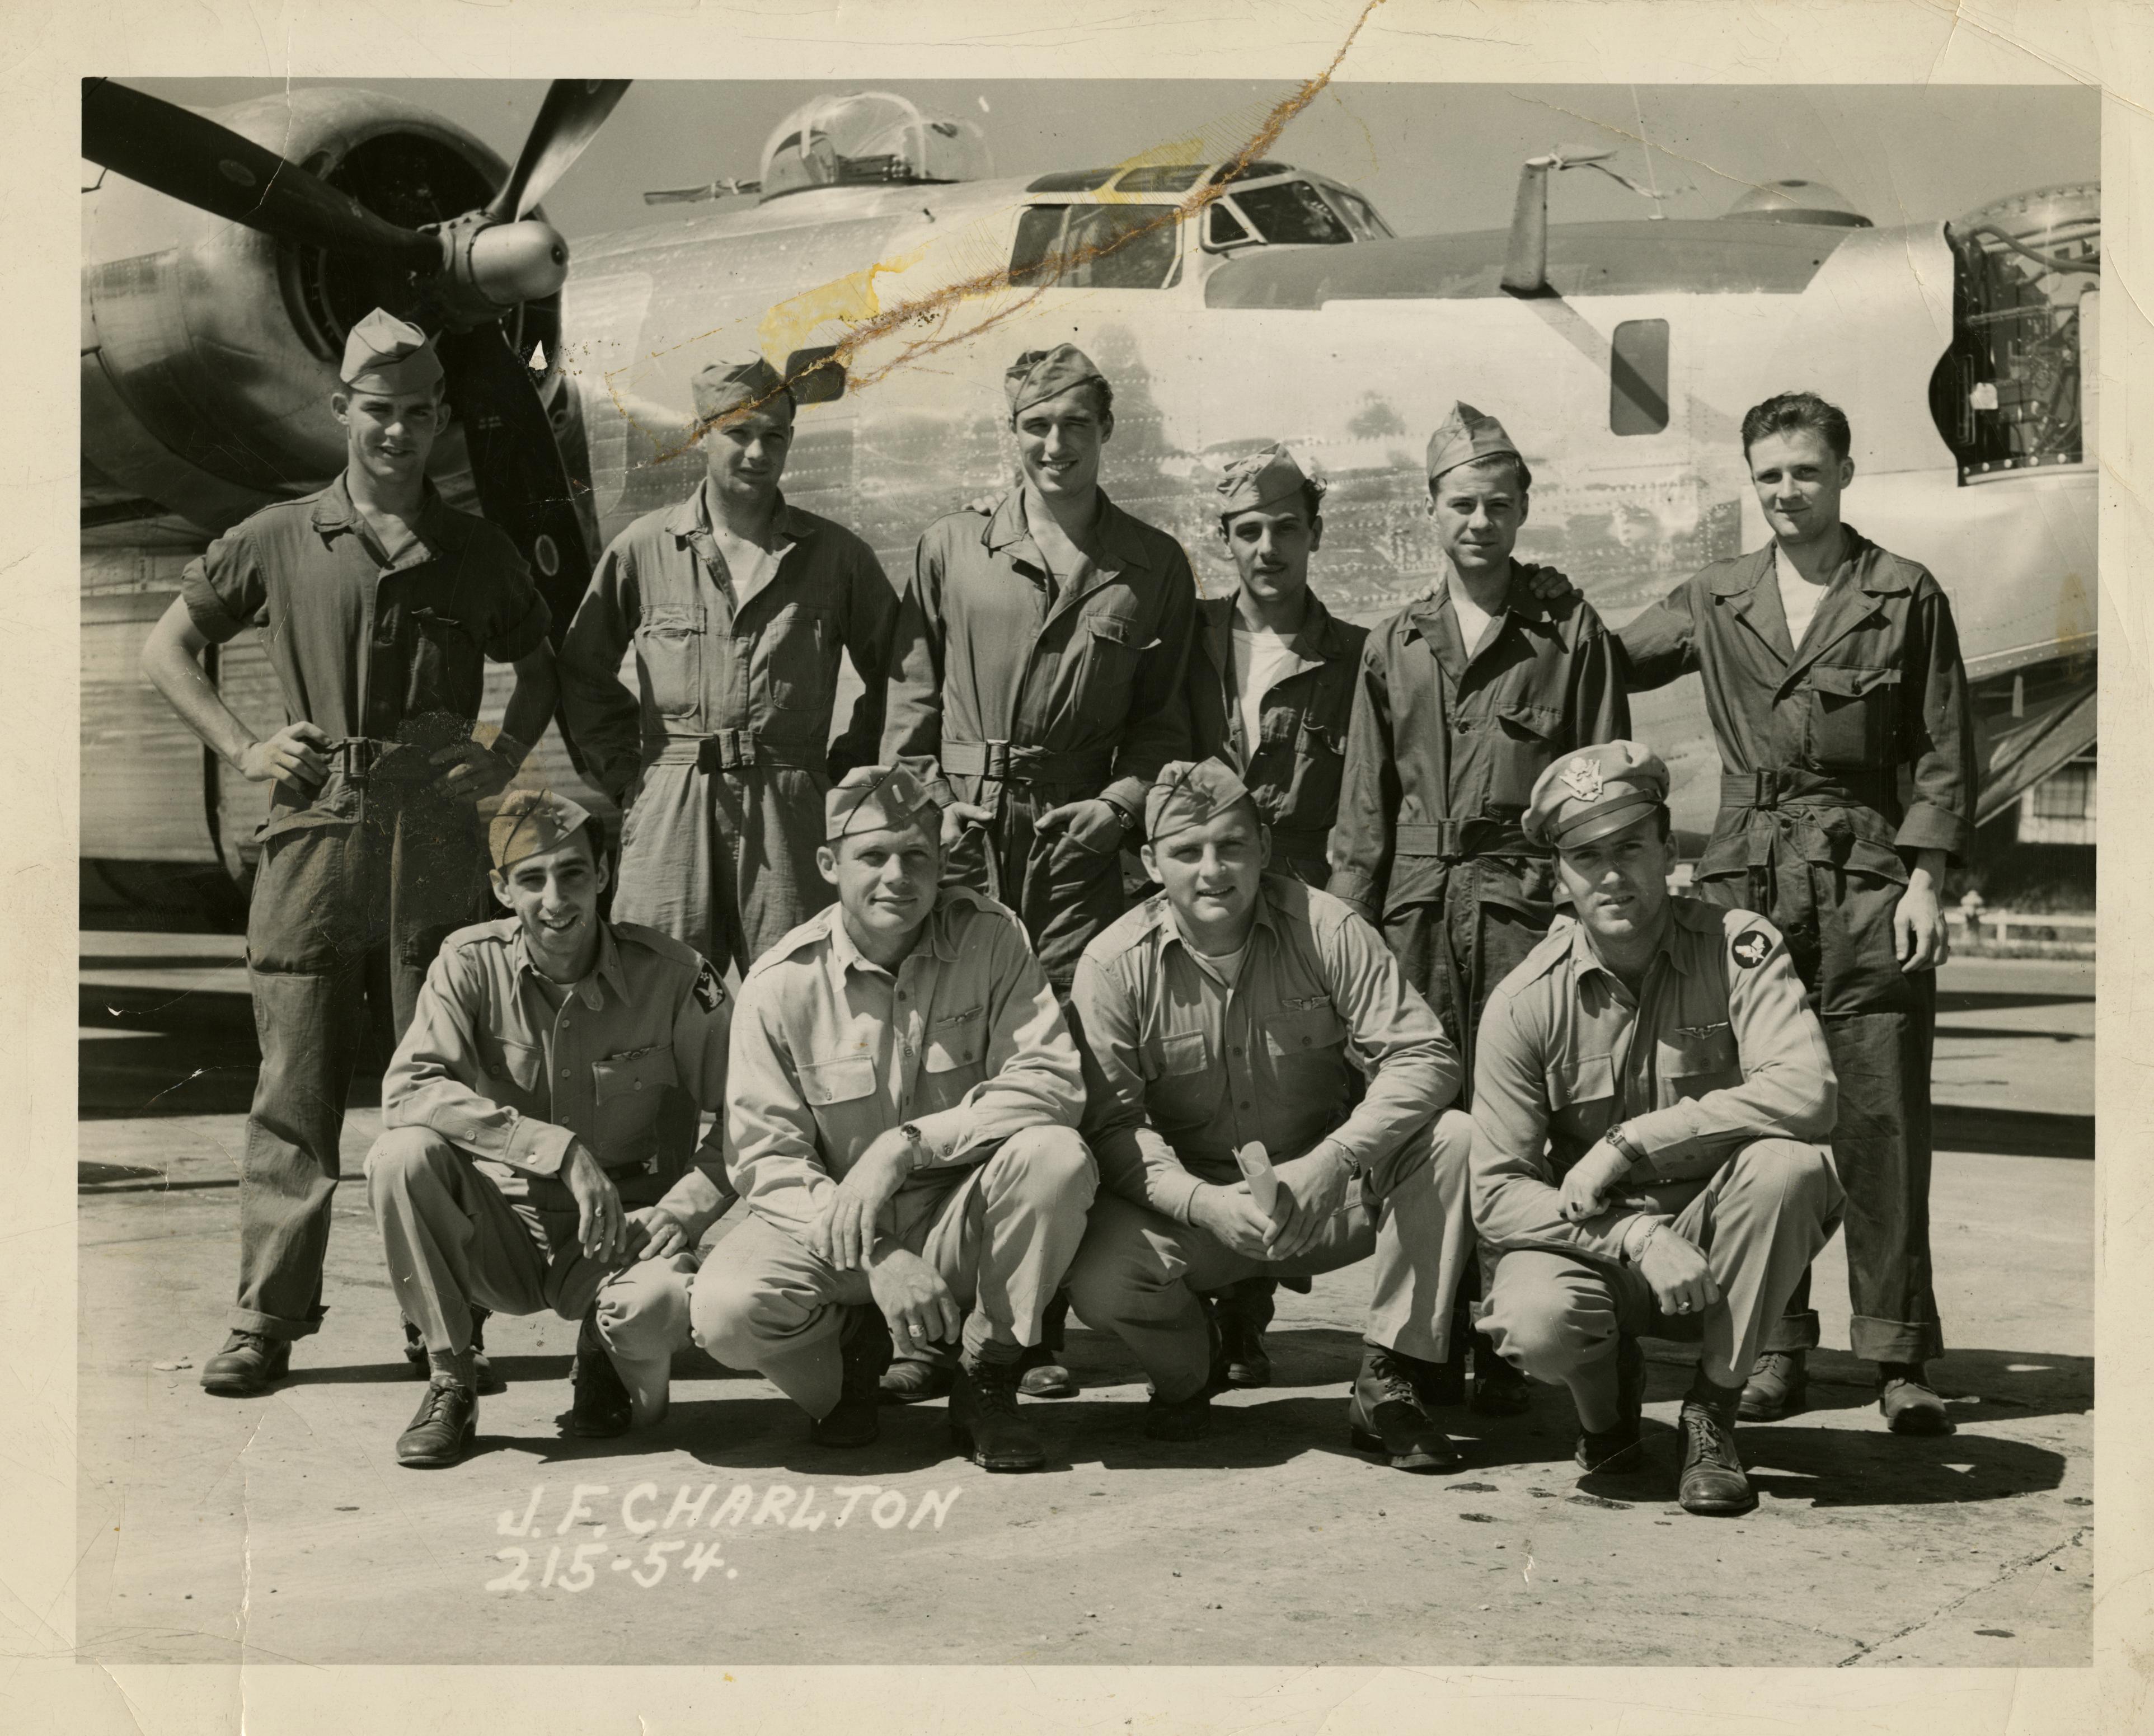 Harold Glasser with Flight Crew